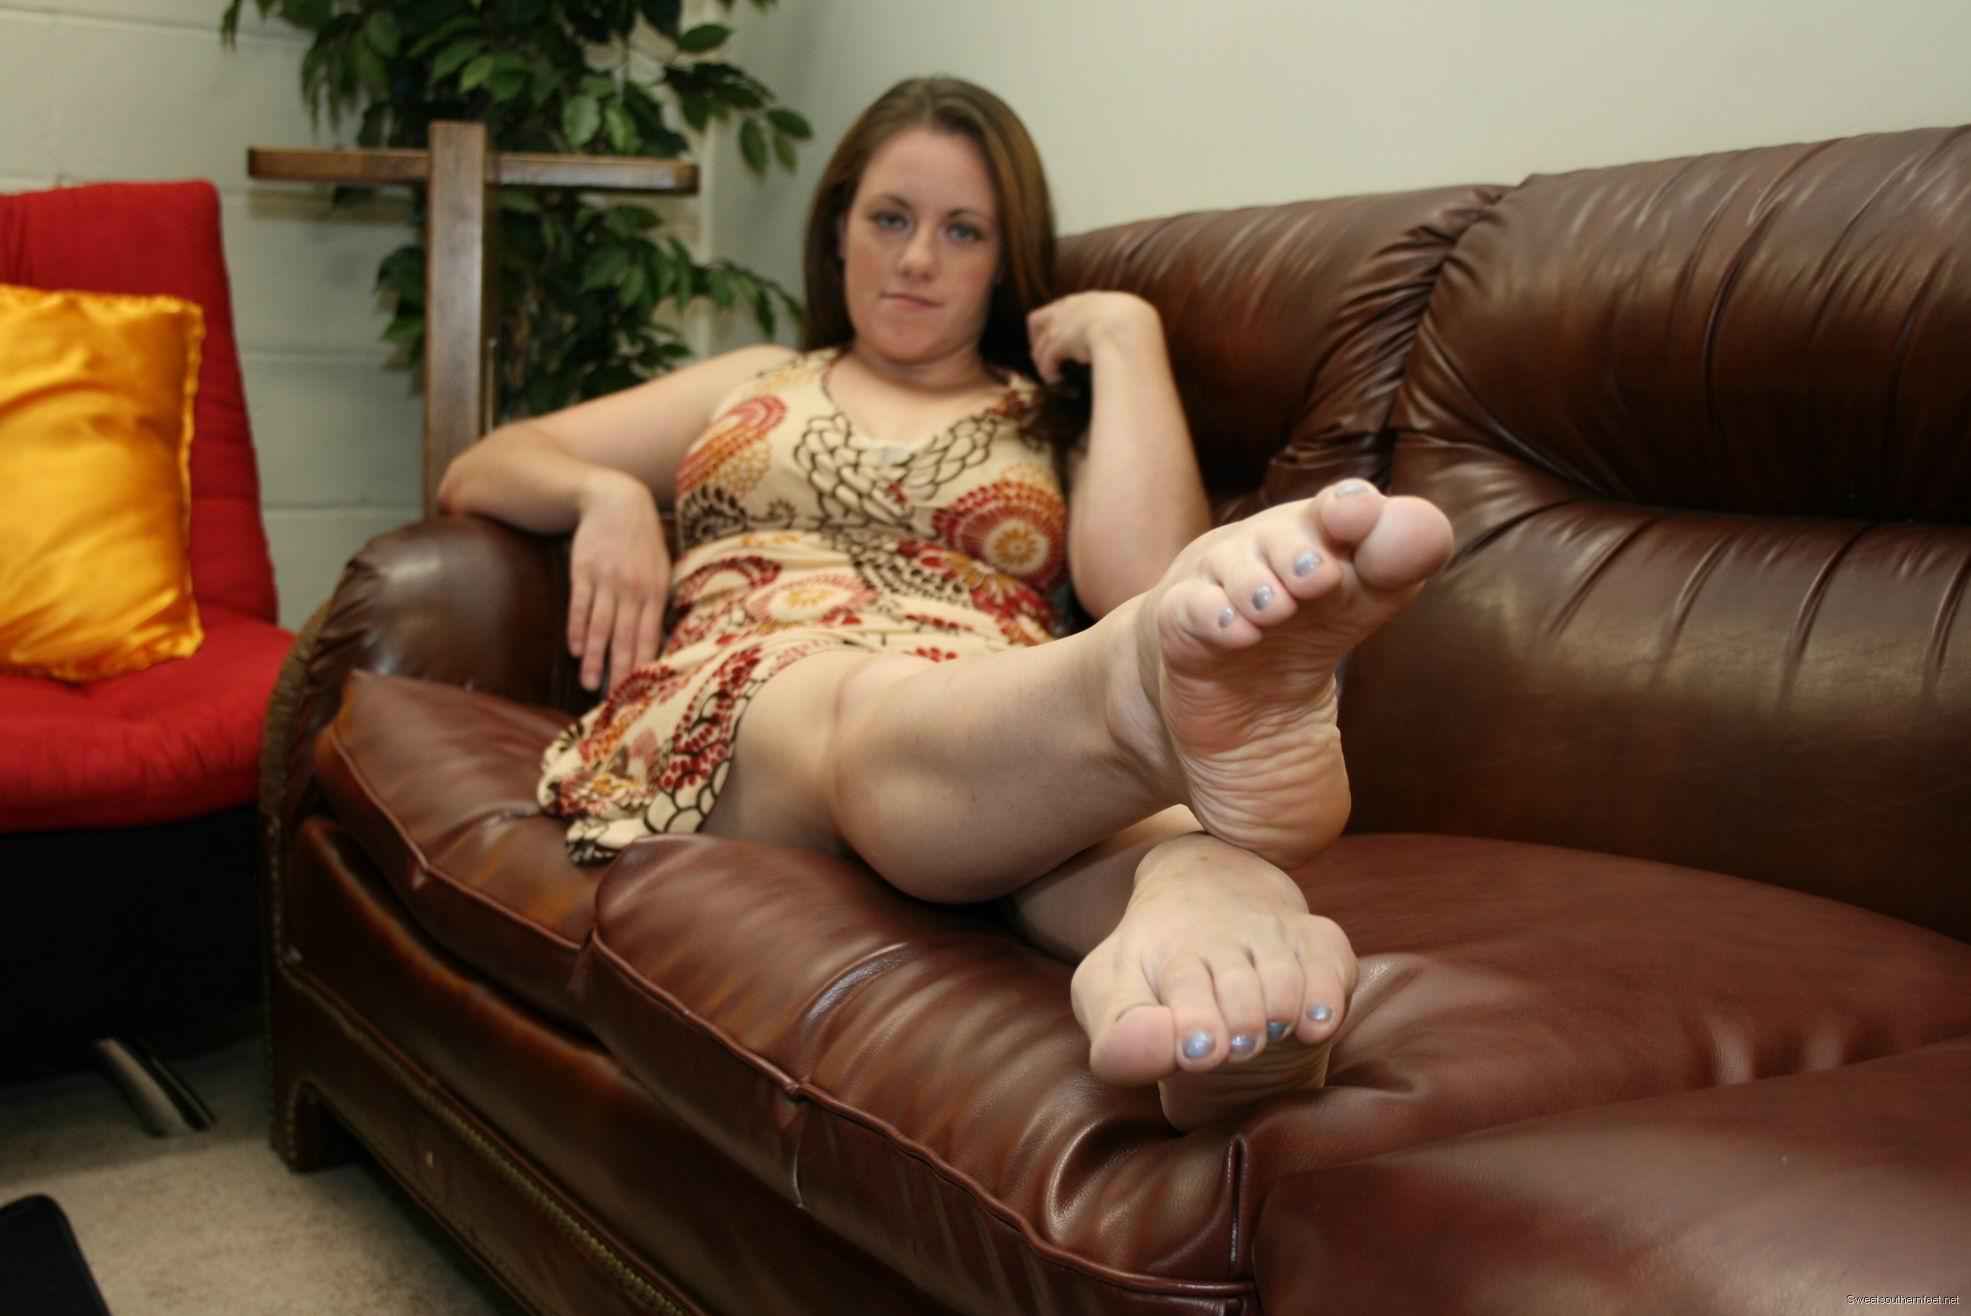 Sweet Southern Feet - Welcome!